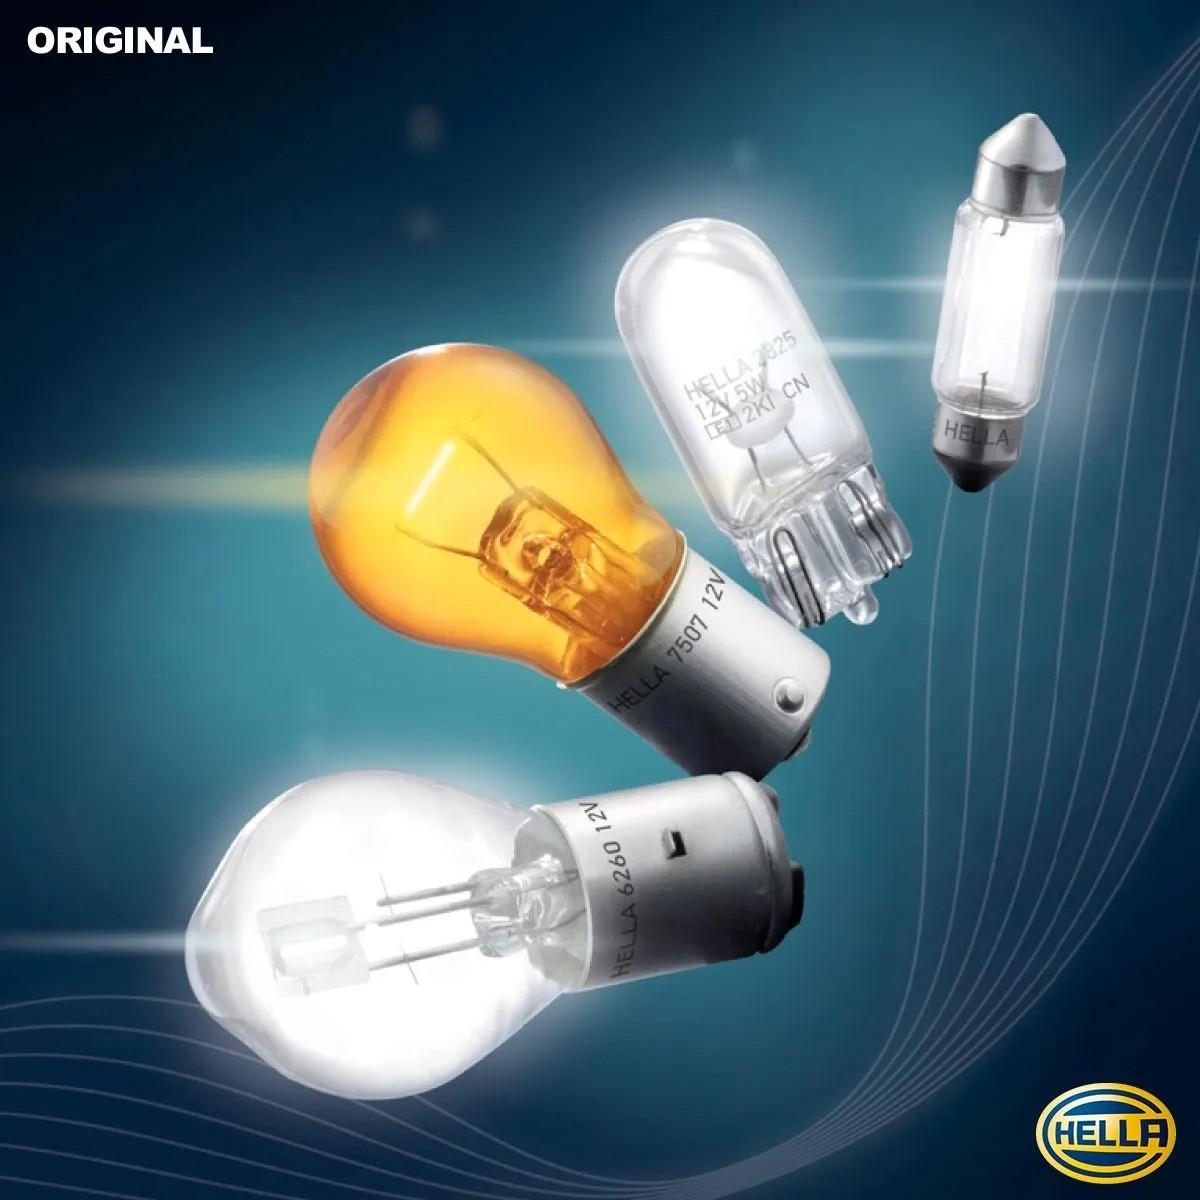 LAMPADA CONVENCIONAL 12V 65W FAROL H9 UNIVERSAL HELLA